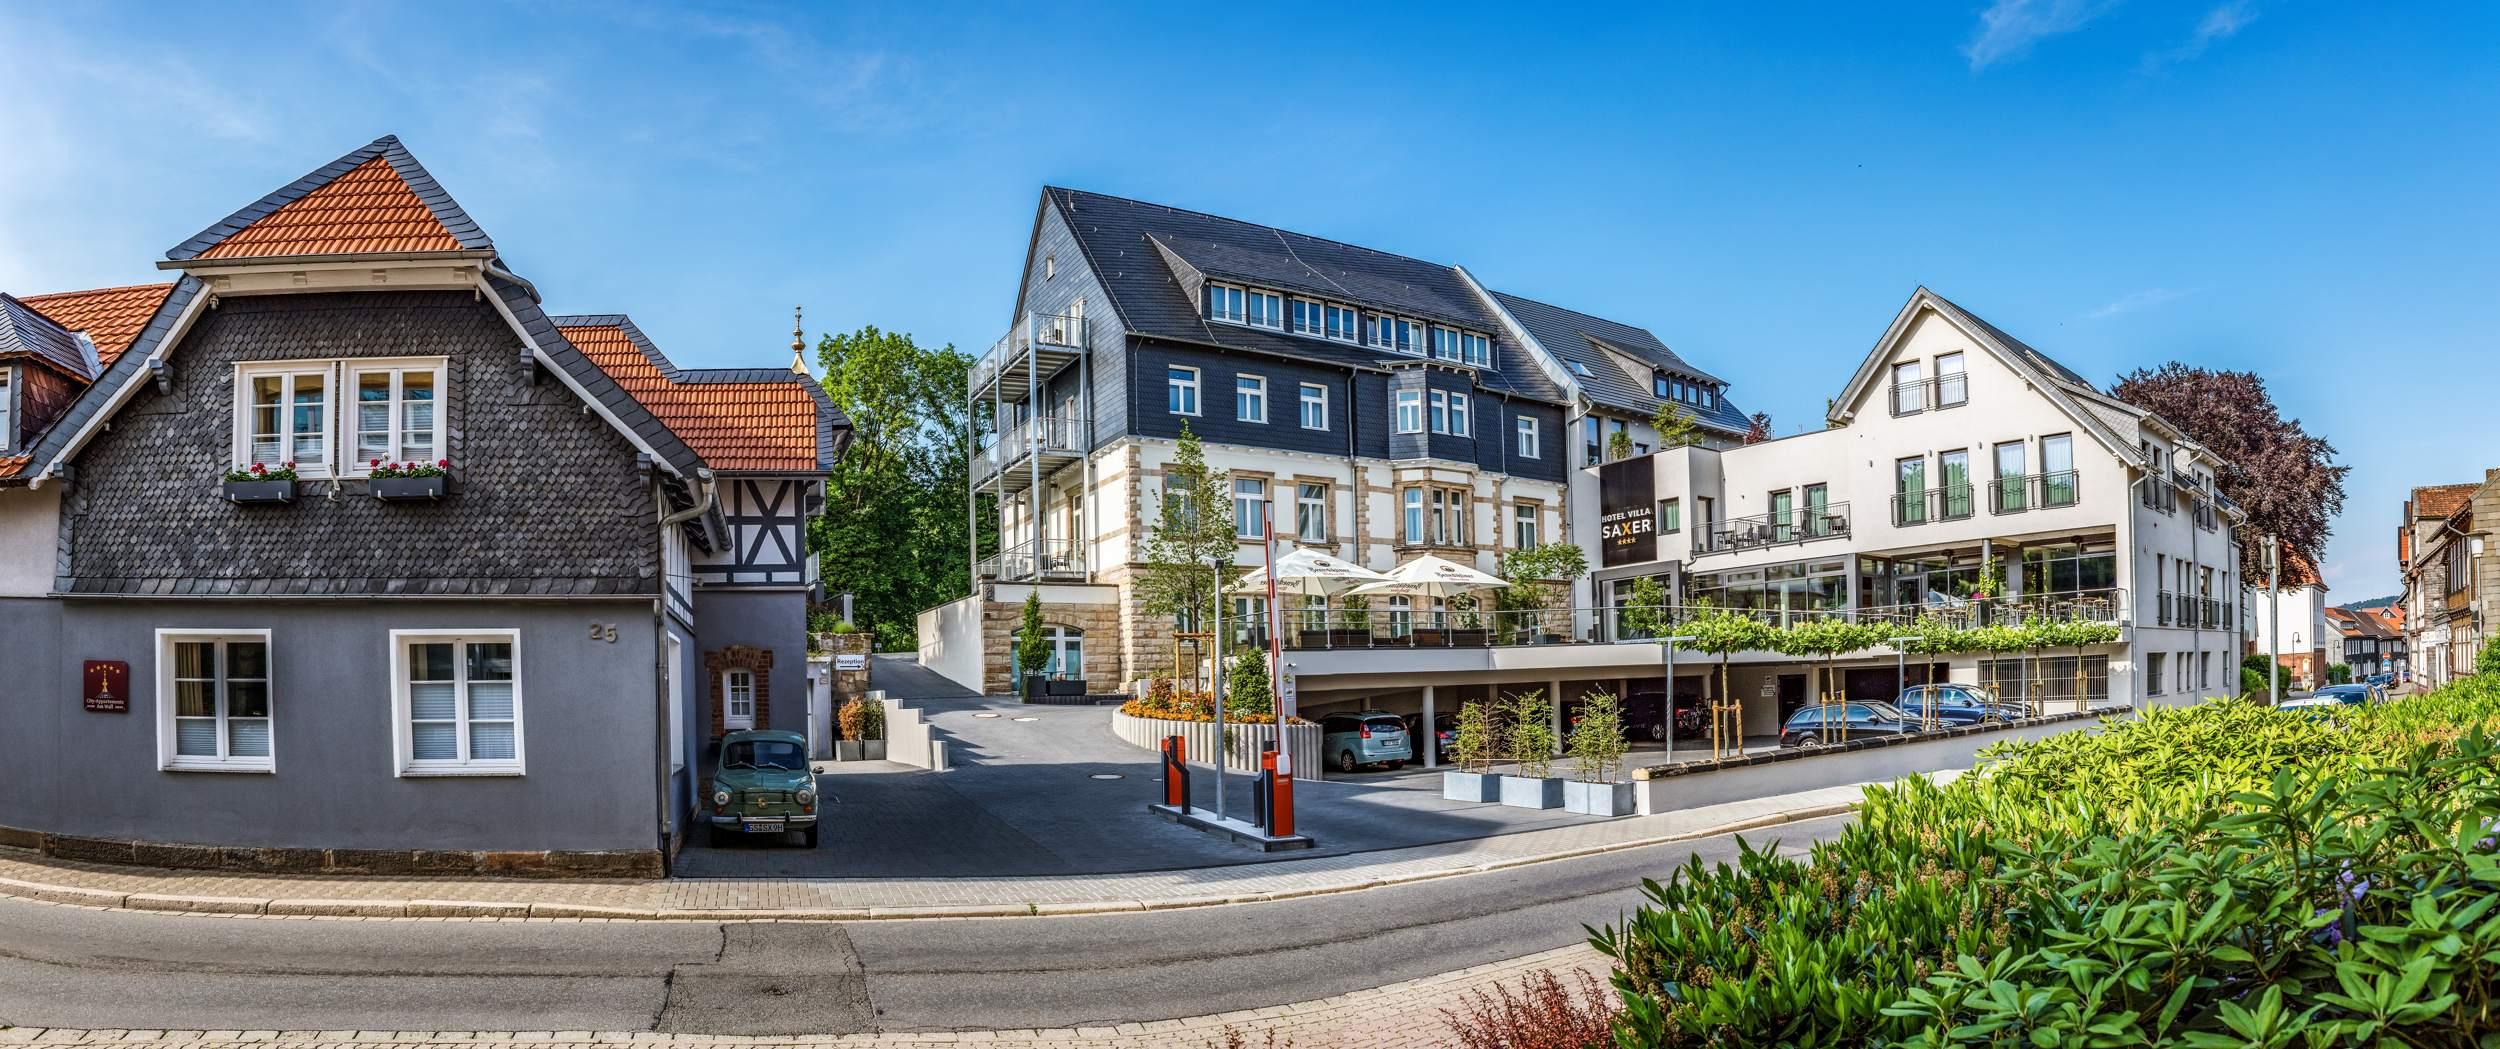 Hotel Villa Saxer in Goslar